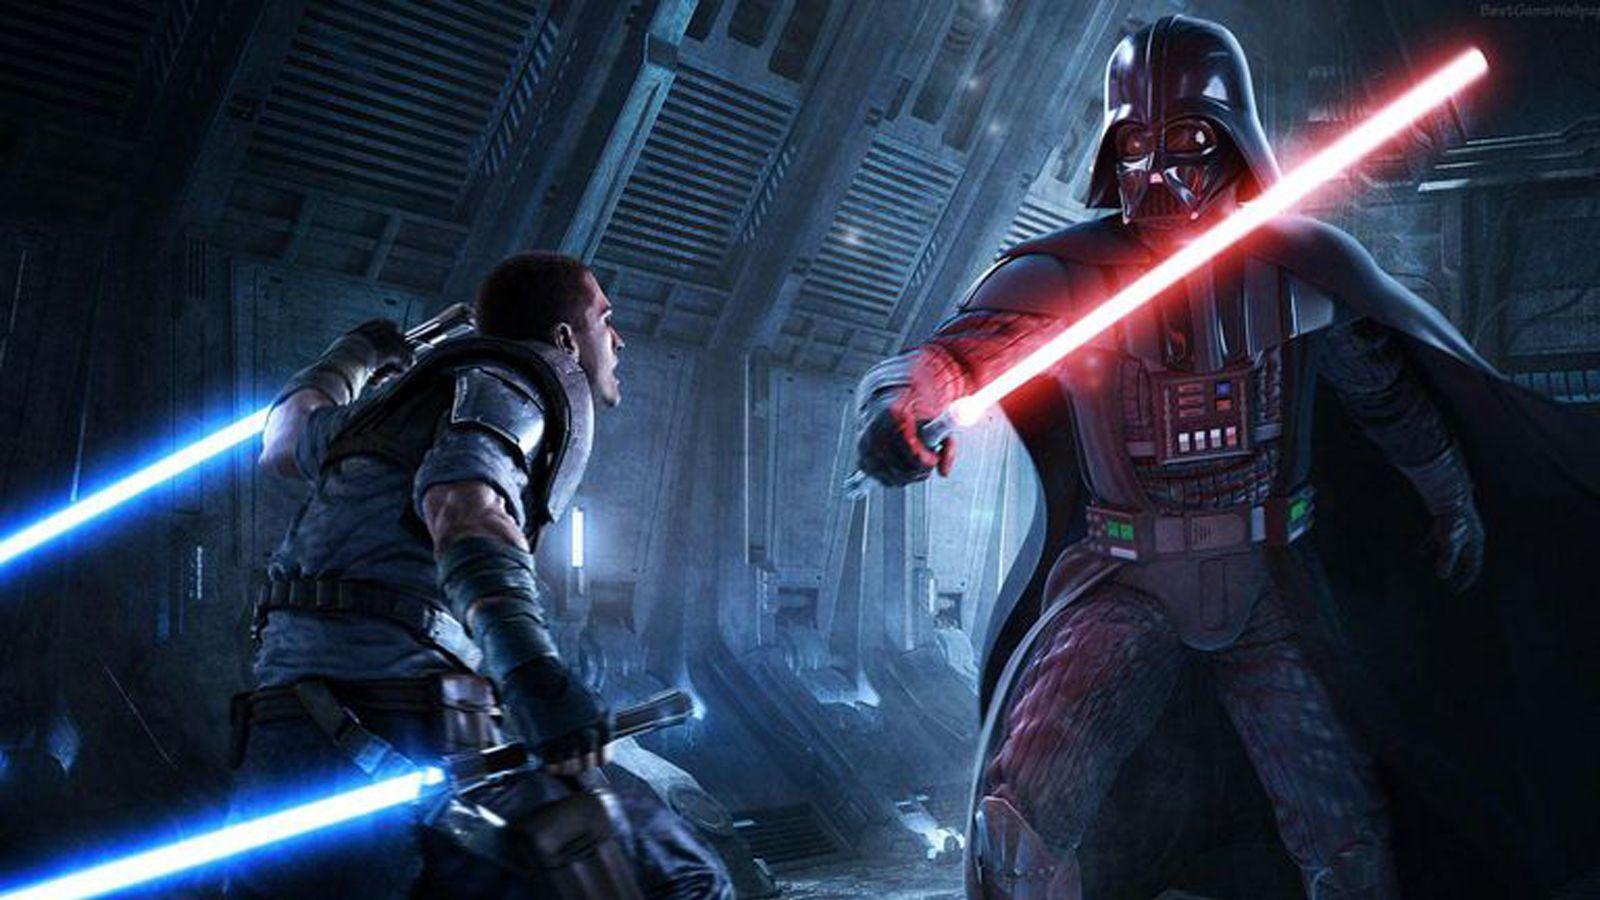 Star Wars Jedi Fallen Order Wallpapers Top Free Star Wars Jedi